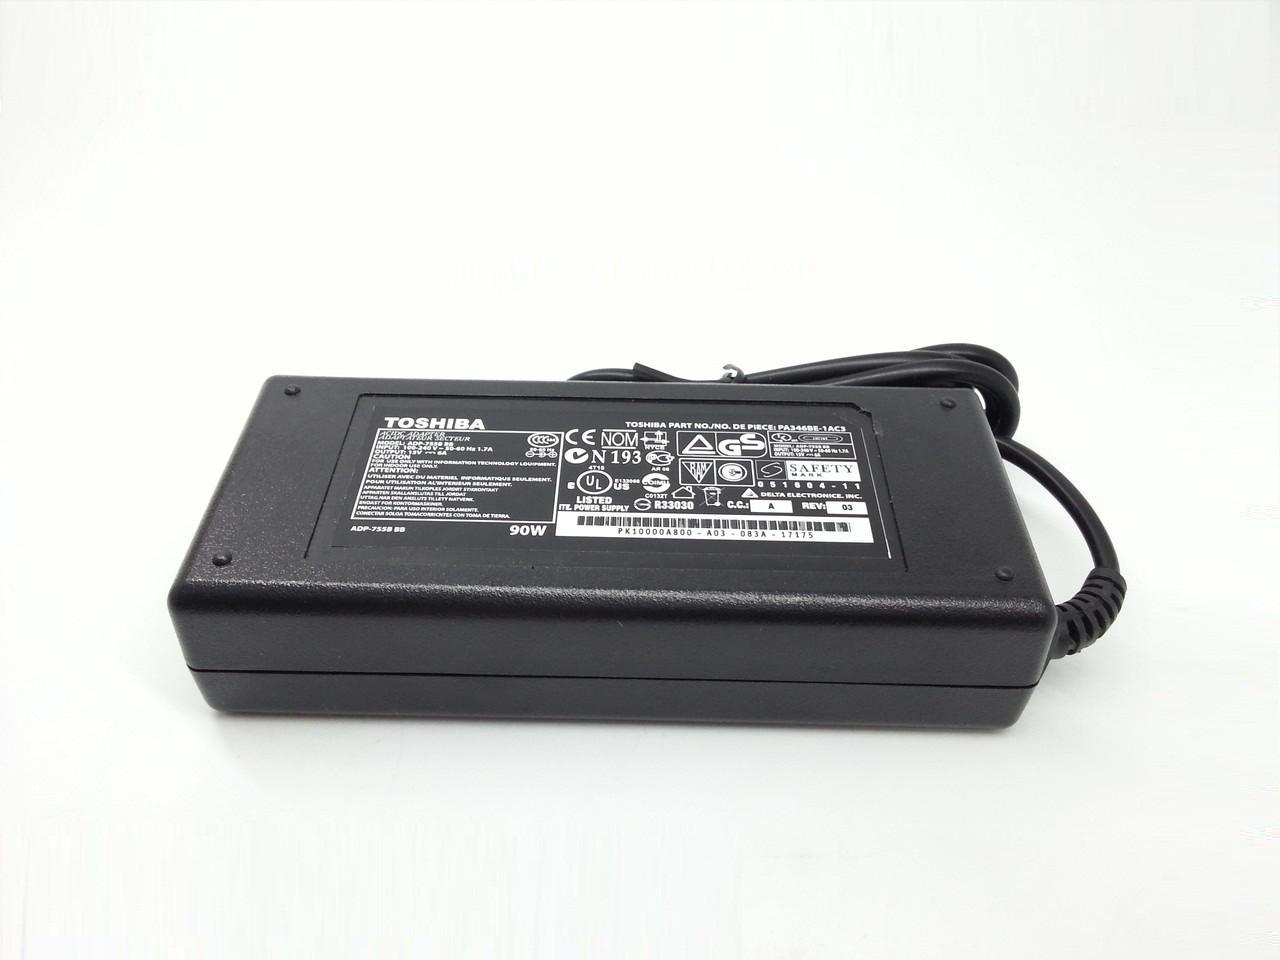 Блок питания для ноутбука Toshiba Satellite А55-s3261 15V 6A 90W 6.3*3.0mm